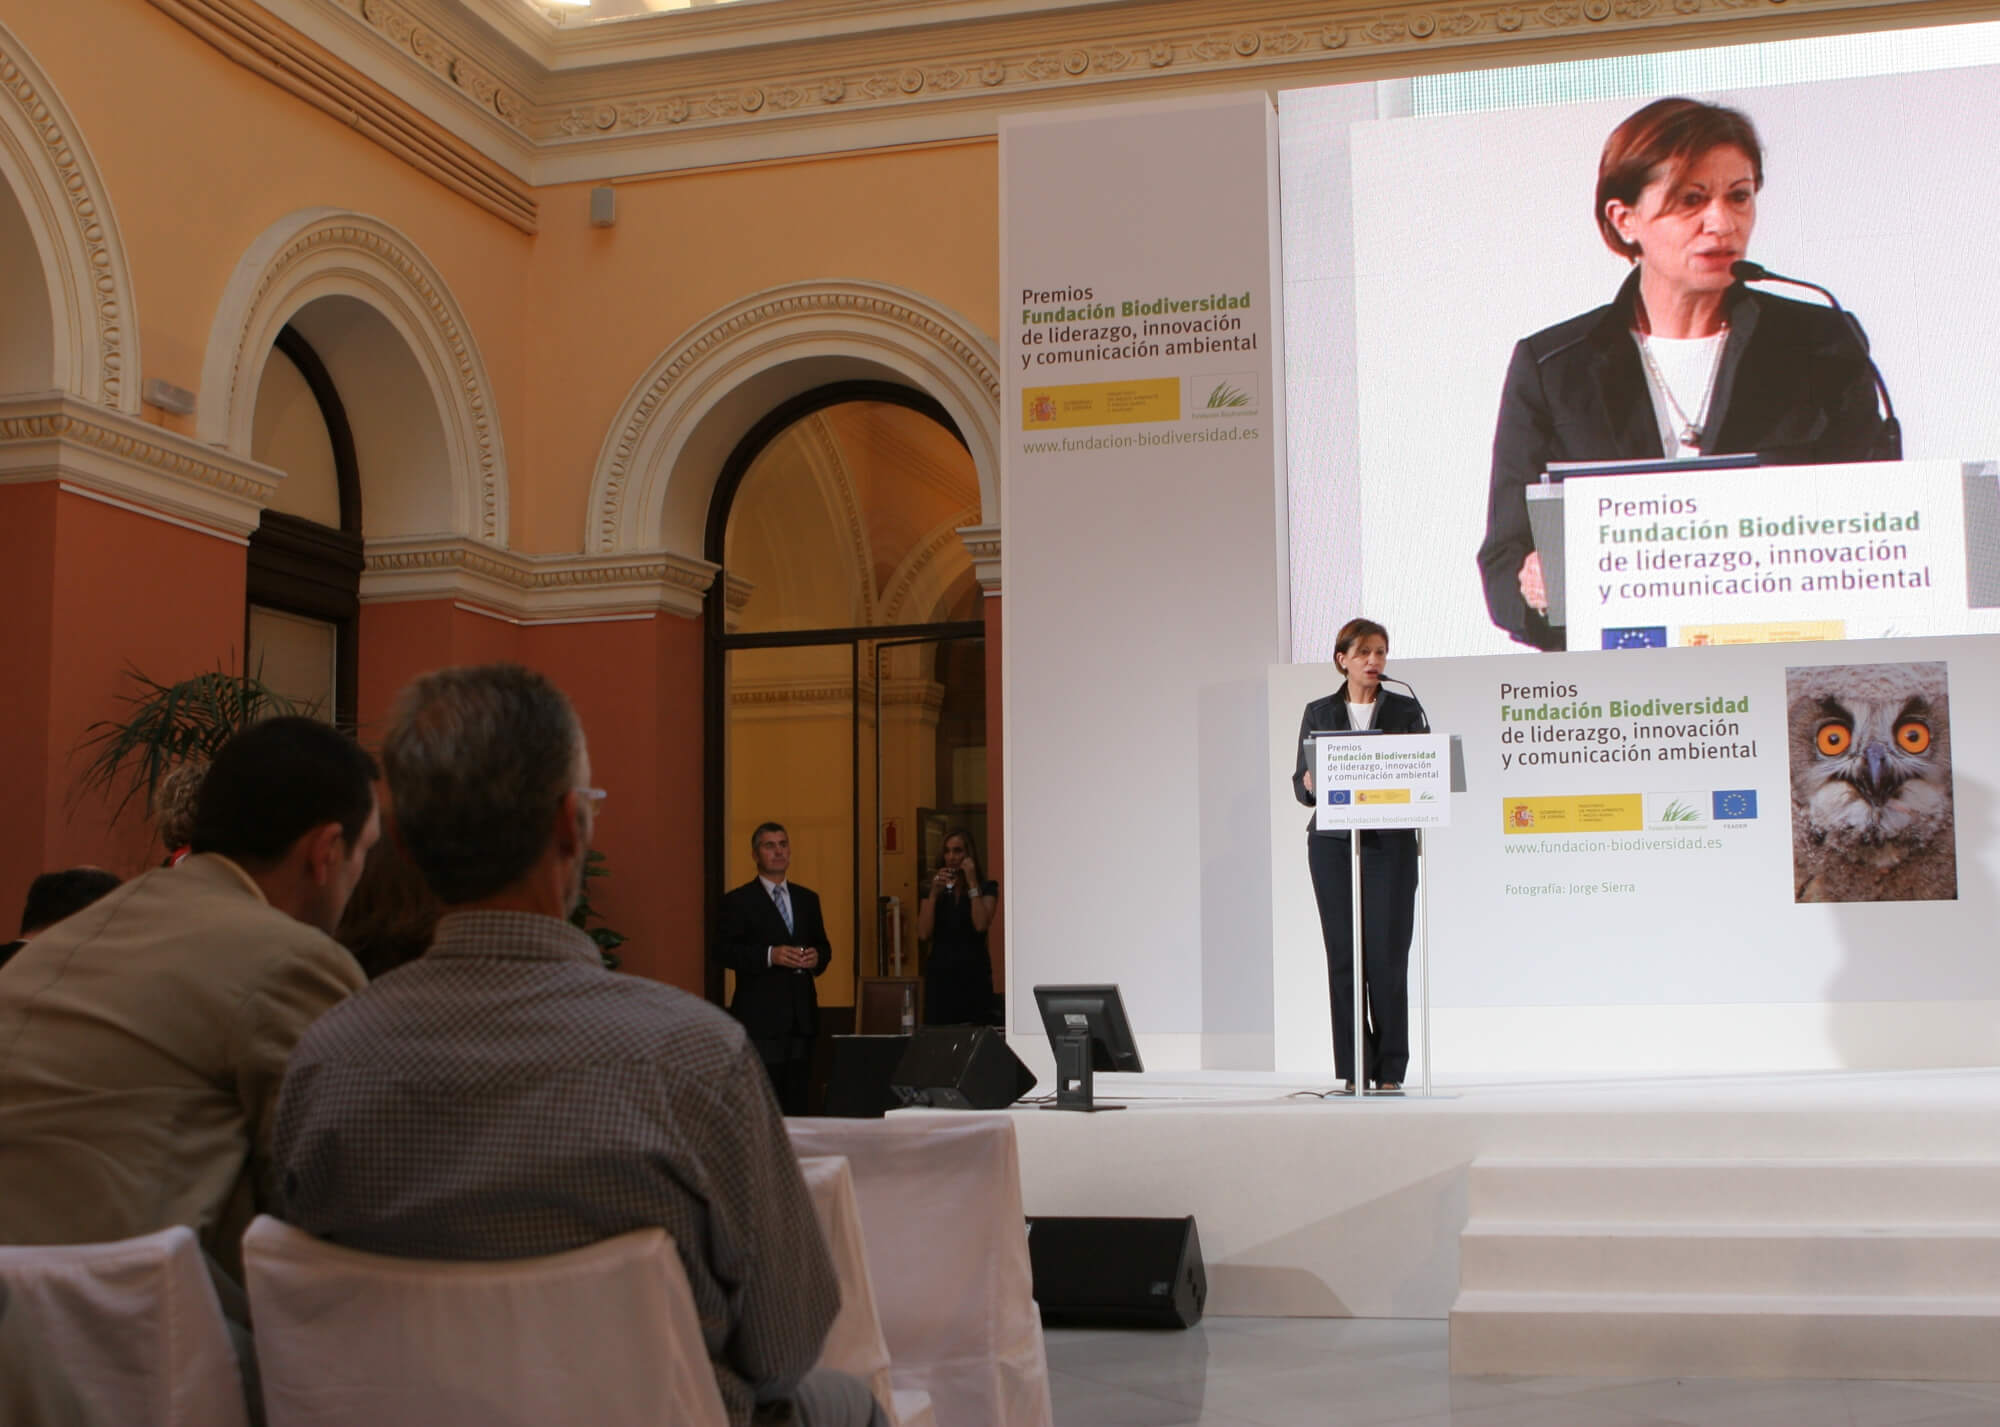 algamar-premio-biodiversidad-discurso-ministra